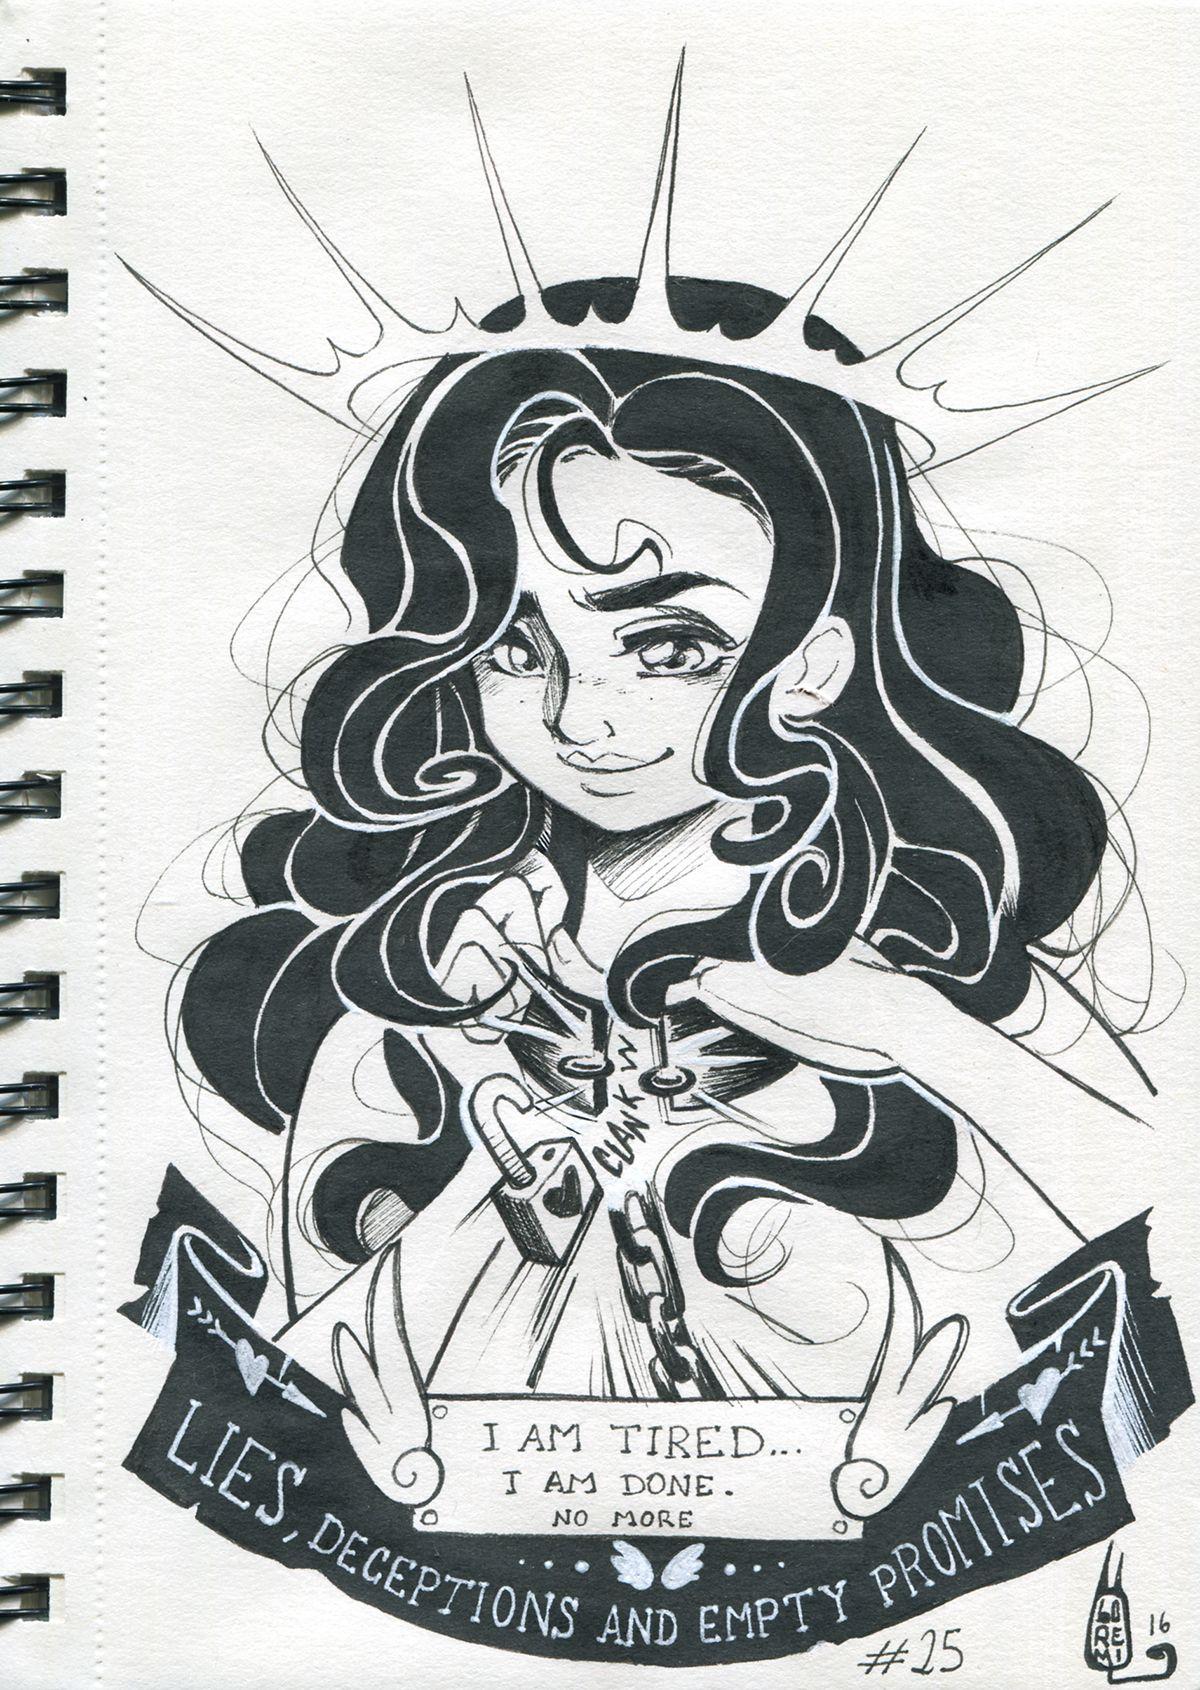 41b4dfea5f Inktober drawings 2016 on Behance.  Tired ink 25  portfolio  drawing  ink   inktober  woman  blackhaired  doodle  art  artist  atrongwoman  freewoman  ...